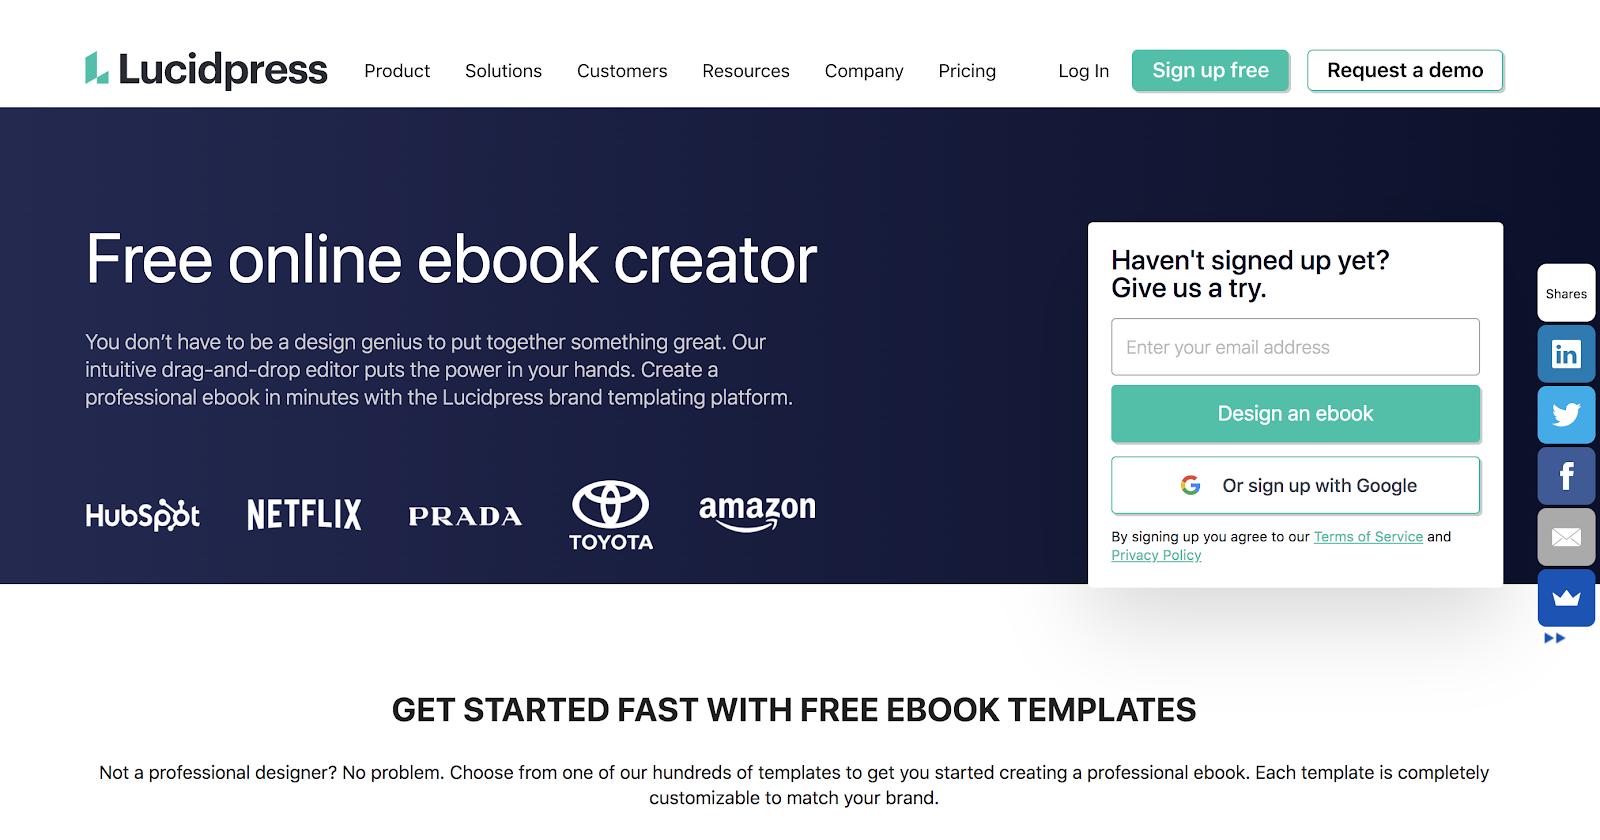 Lucidpress Homepage Screenshot (eBook Designer Tool)